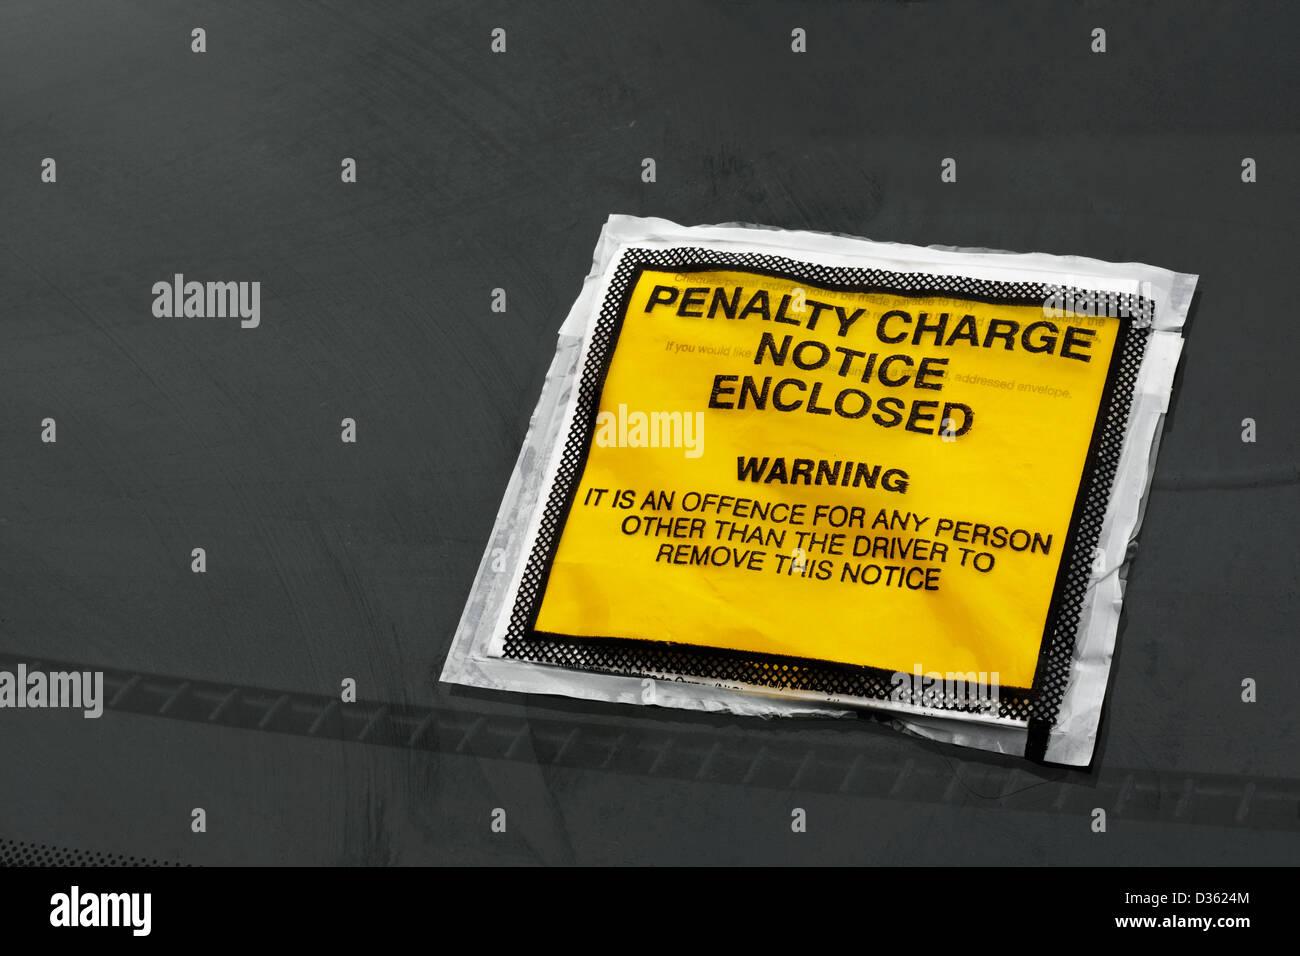 Parking ticket stuck on car windscreen a penalty or fine - Stock Image